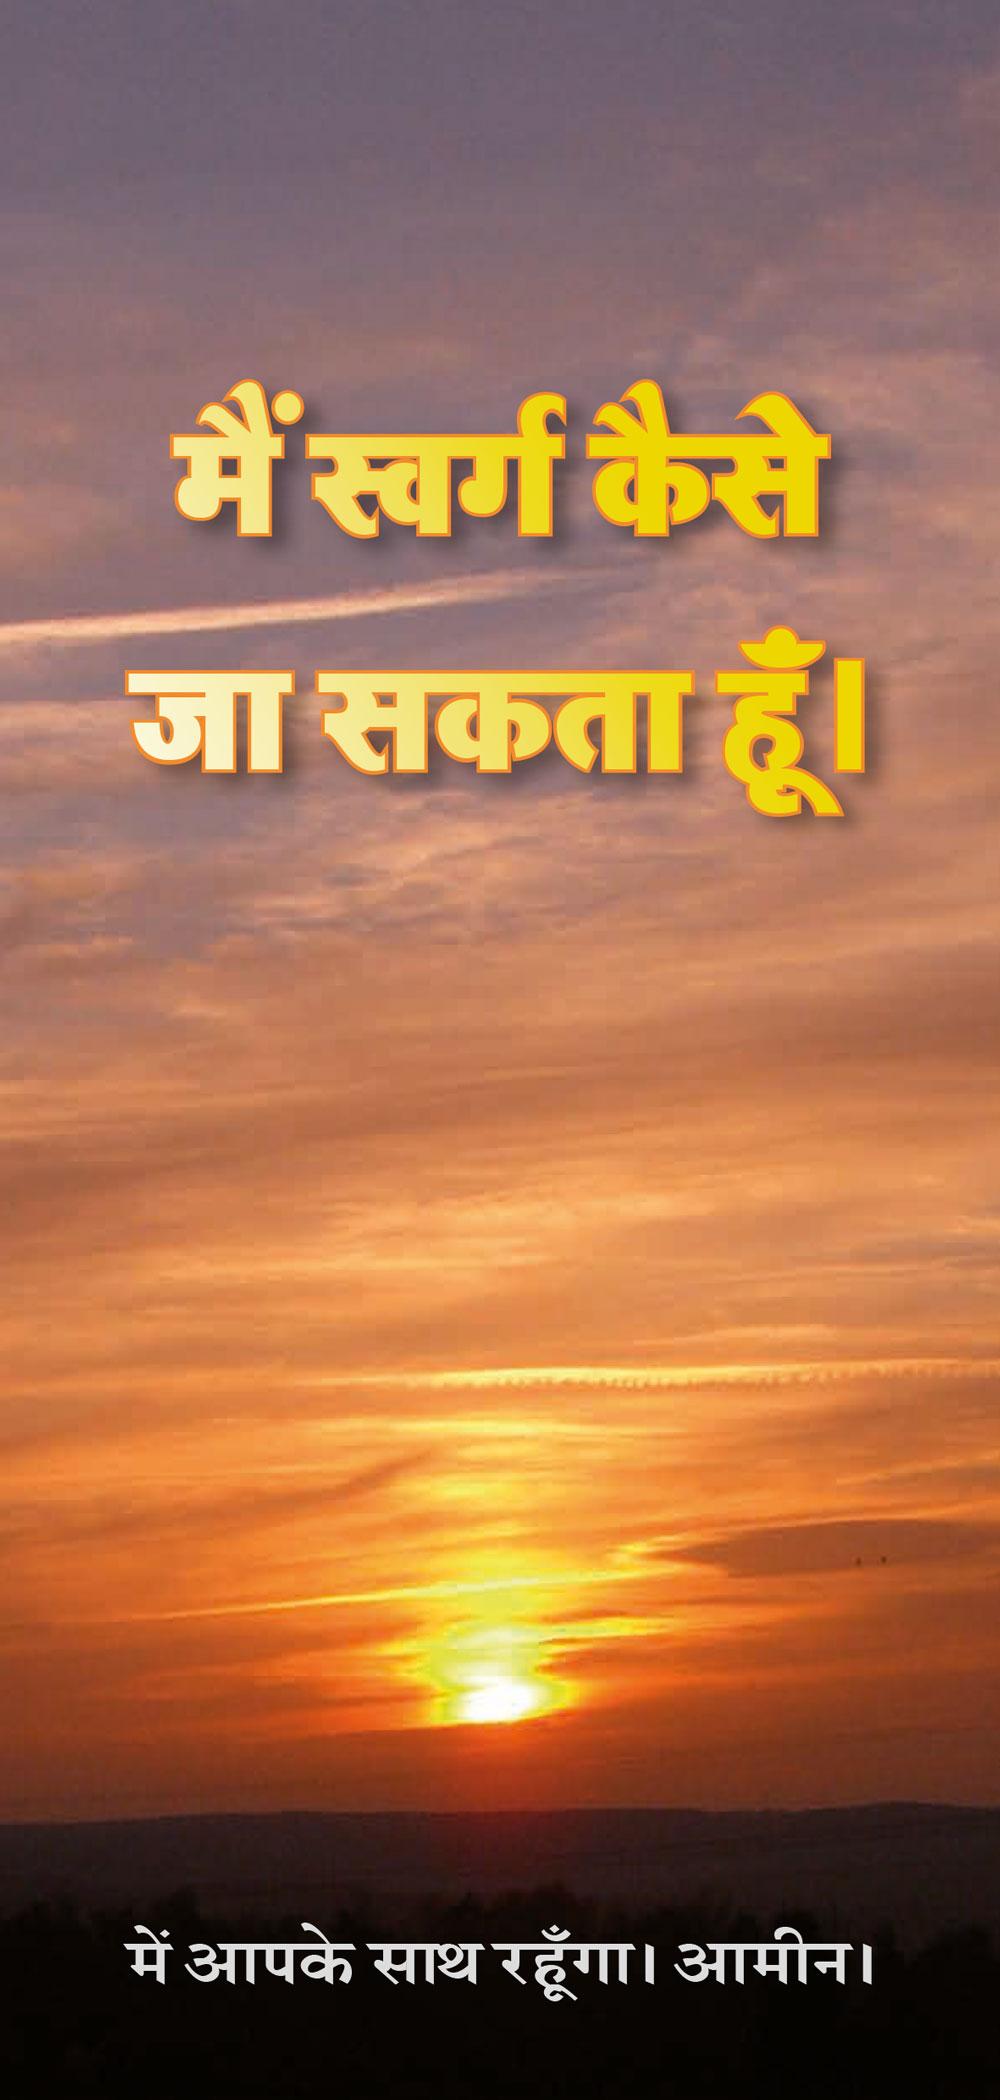 Hindi: Wie komme ich in den Himmel?